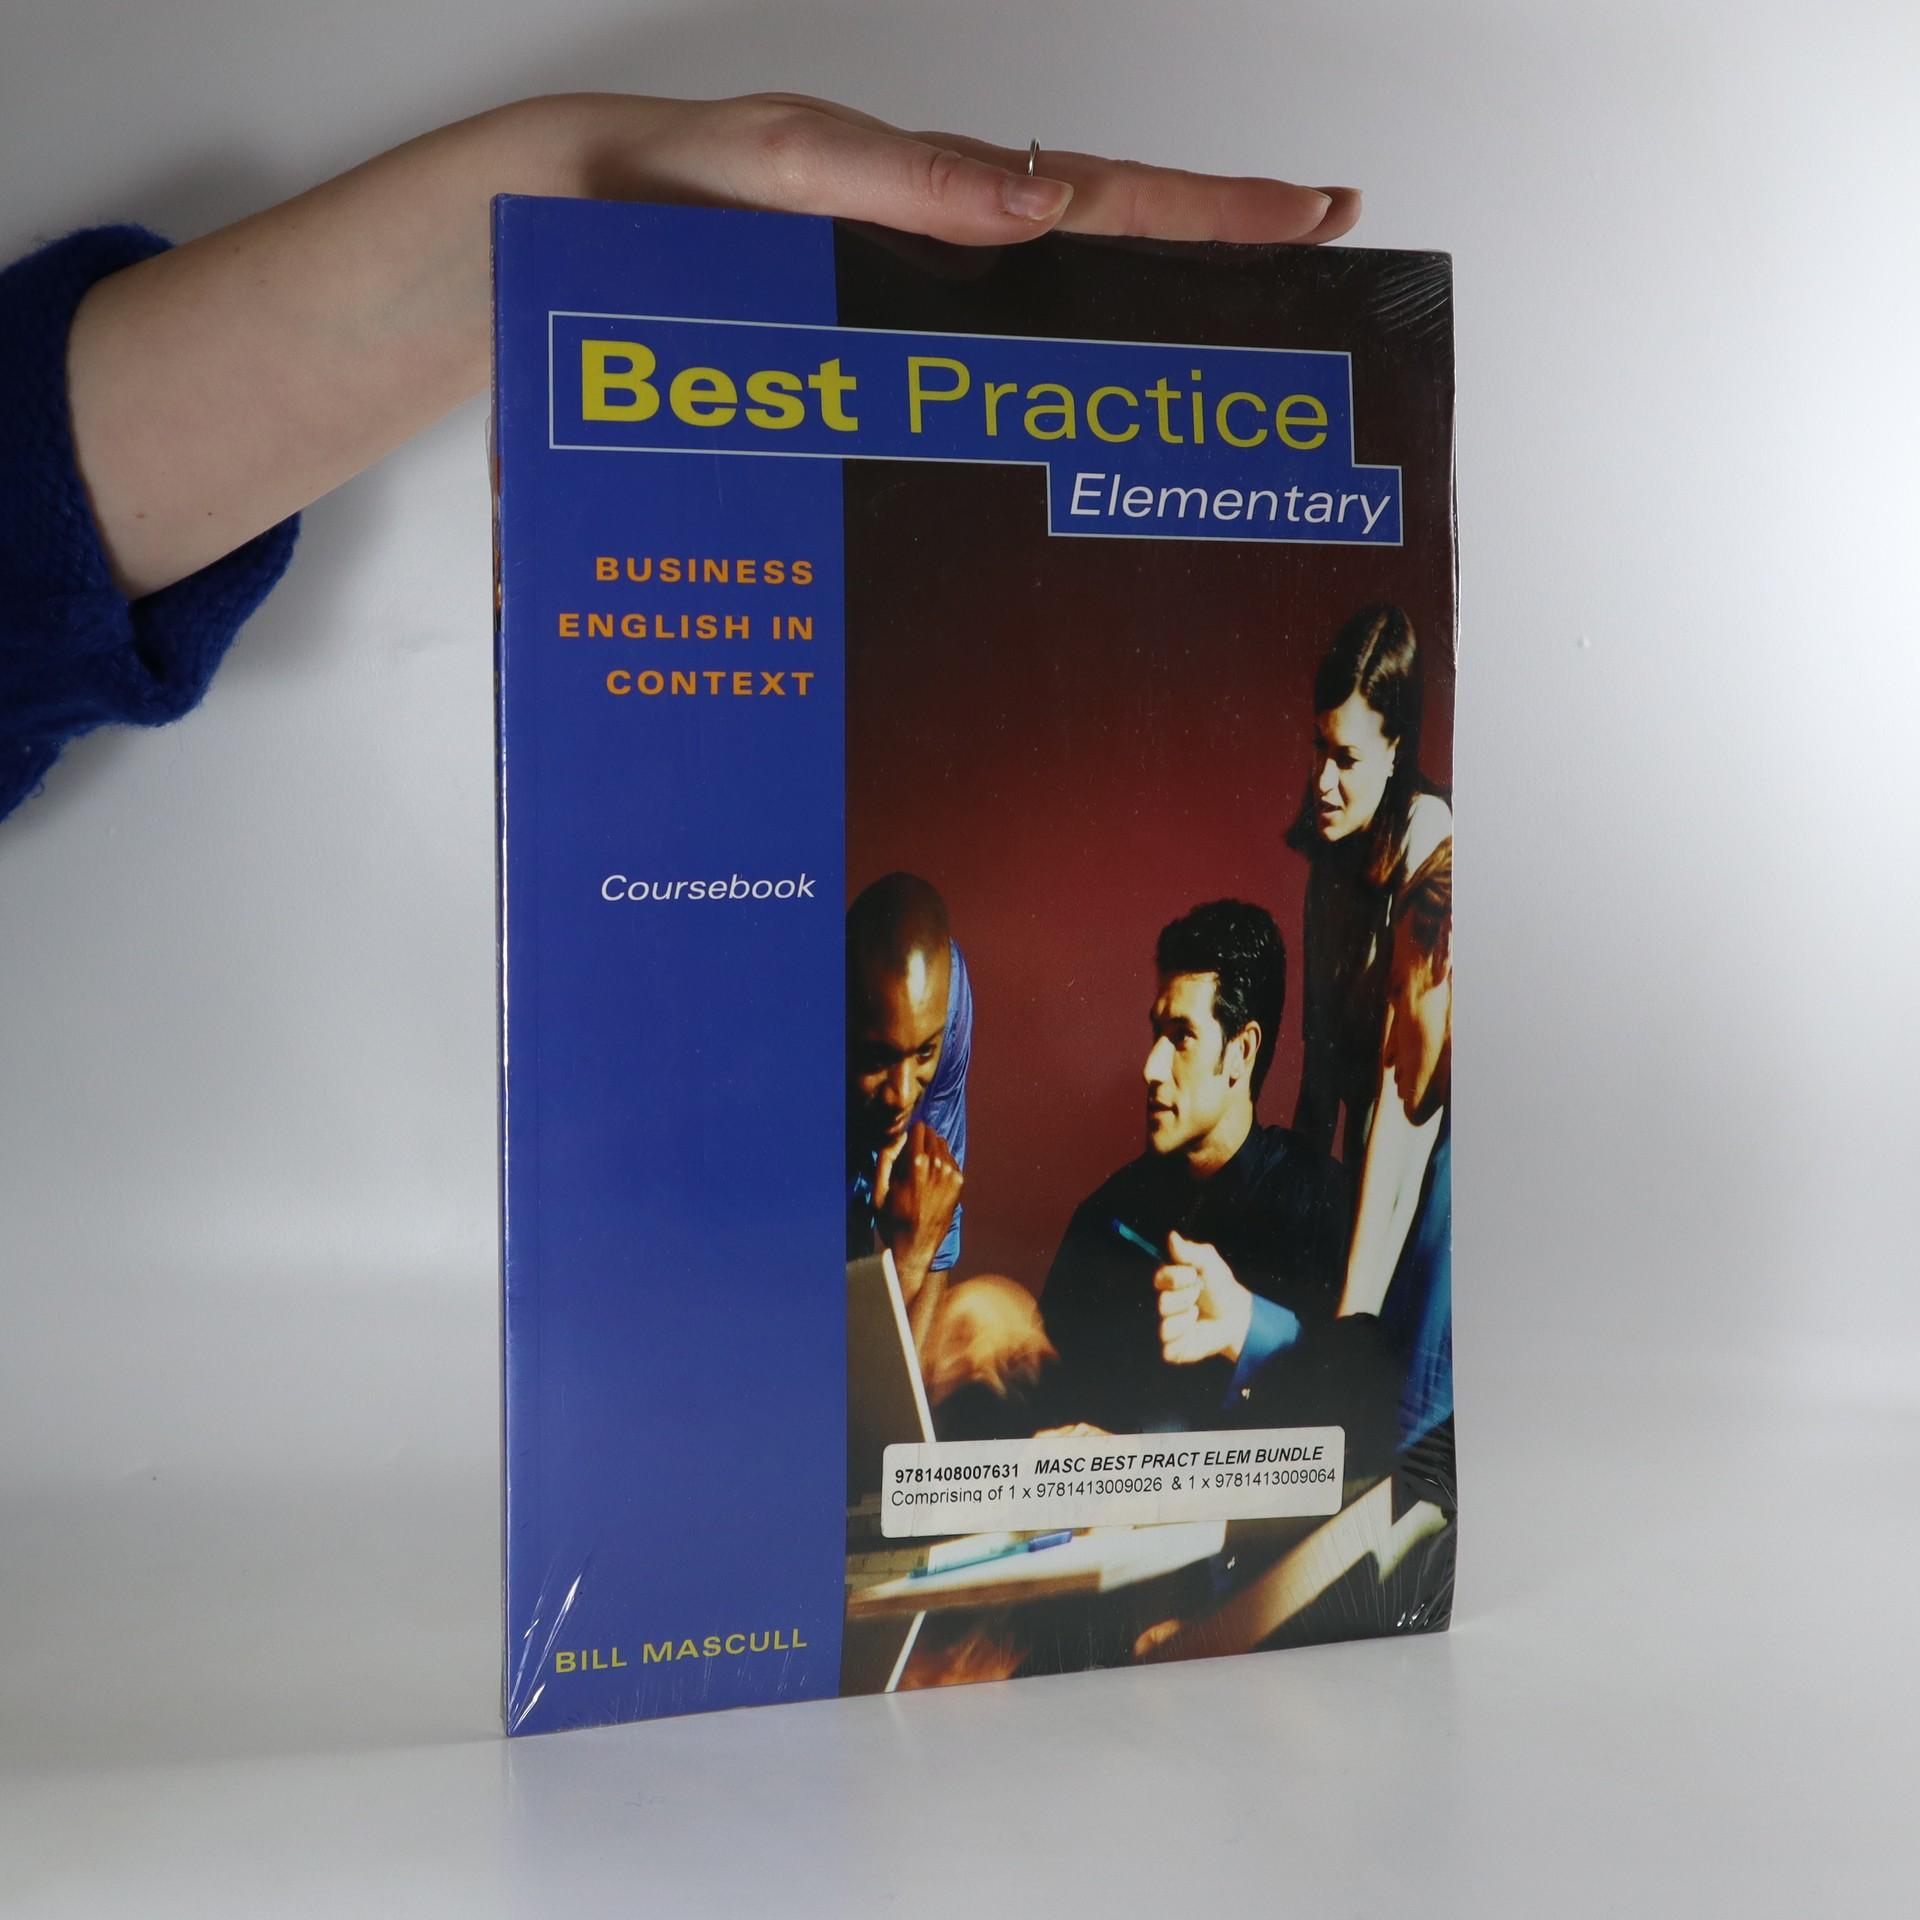 antikvární kniha Best Practice. Elementary. Business English in Context. Coursebook, neuveden